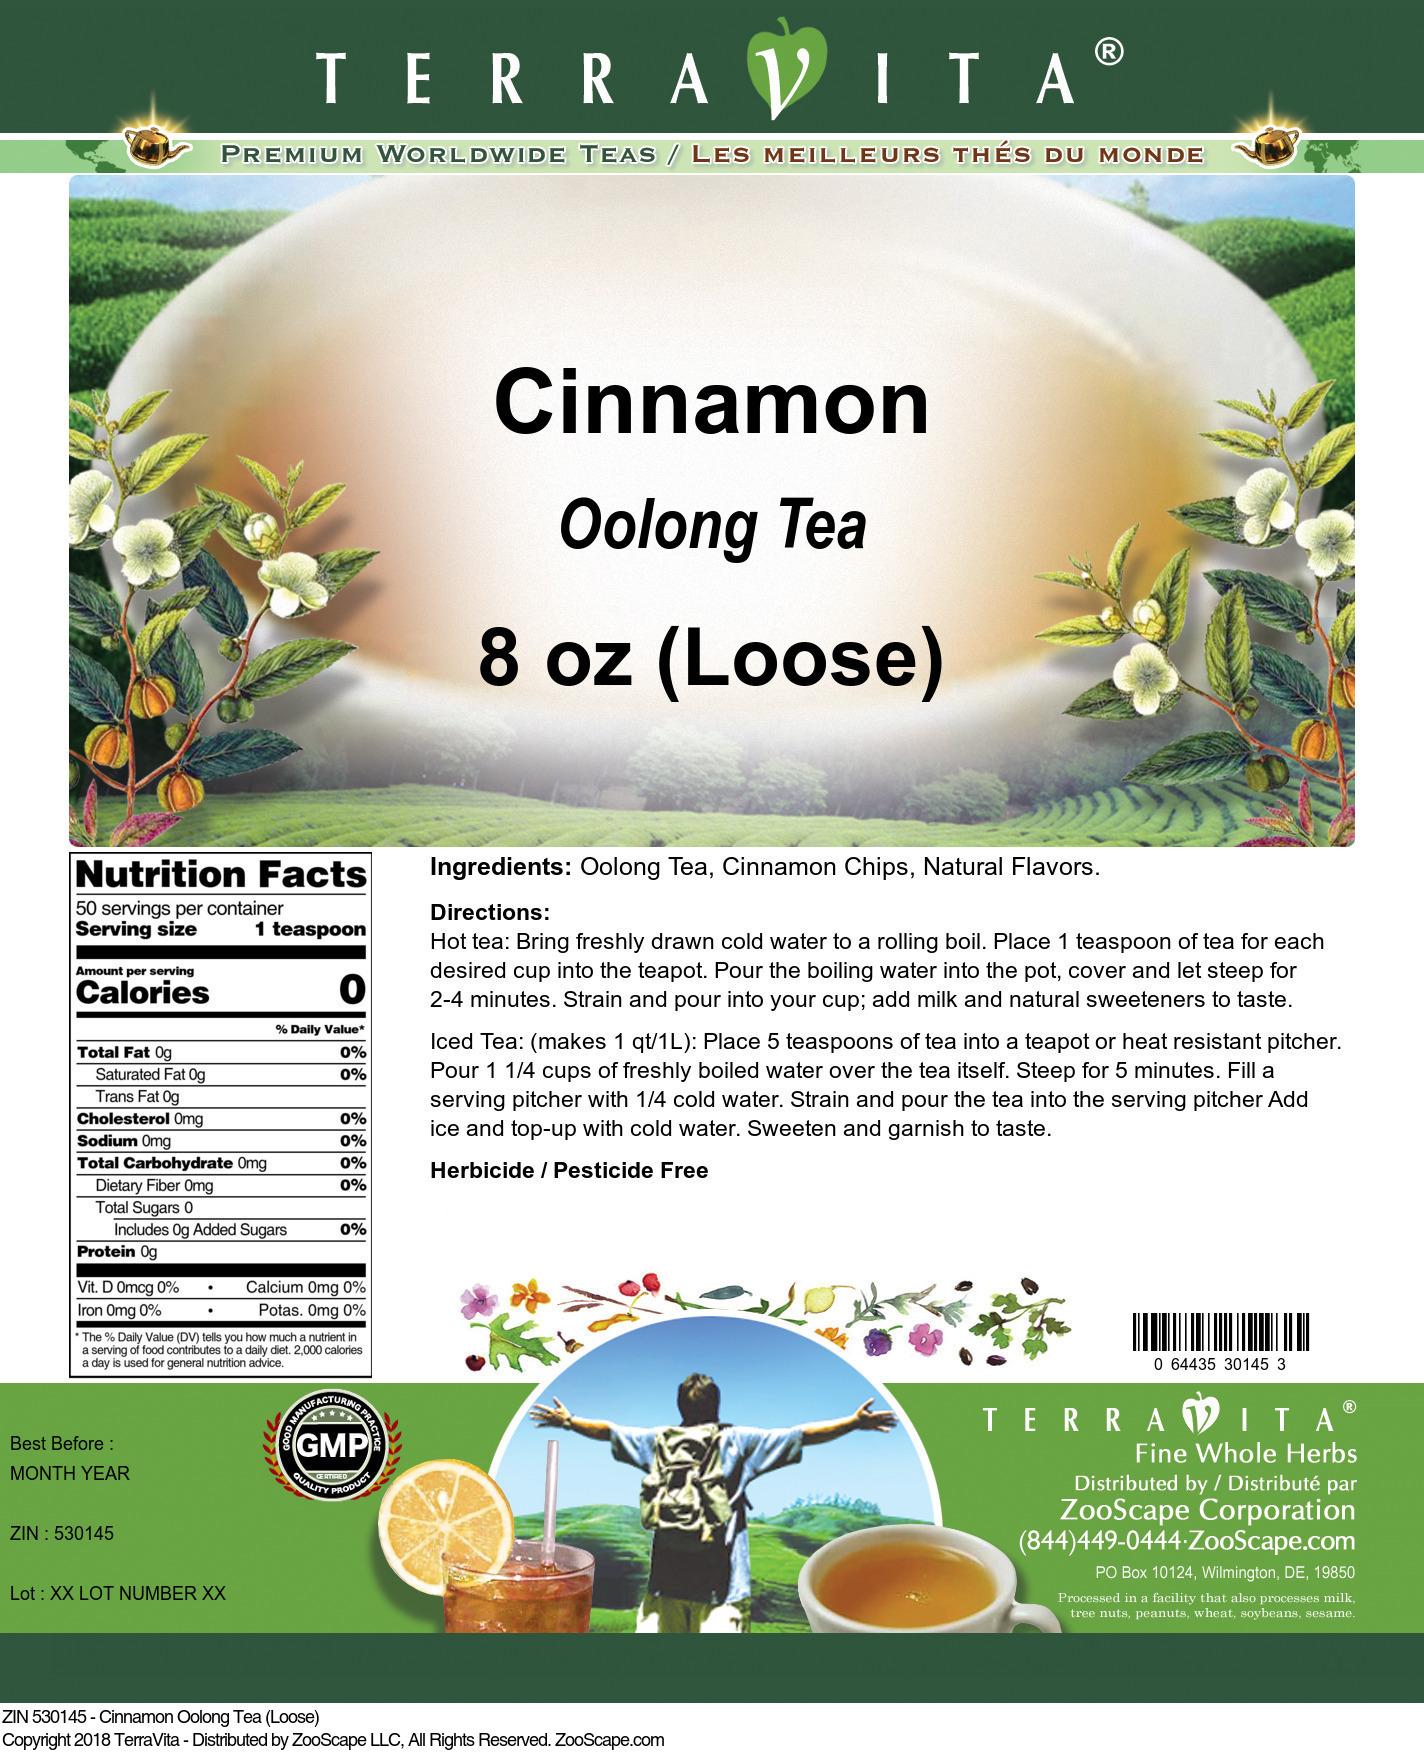 Cinnamon Oolong Tea